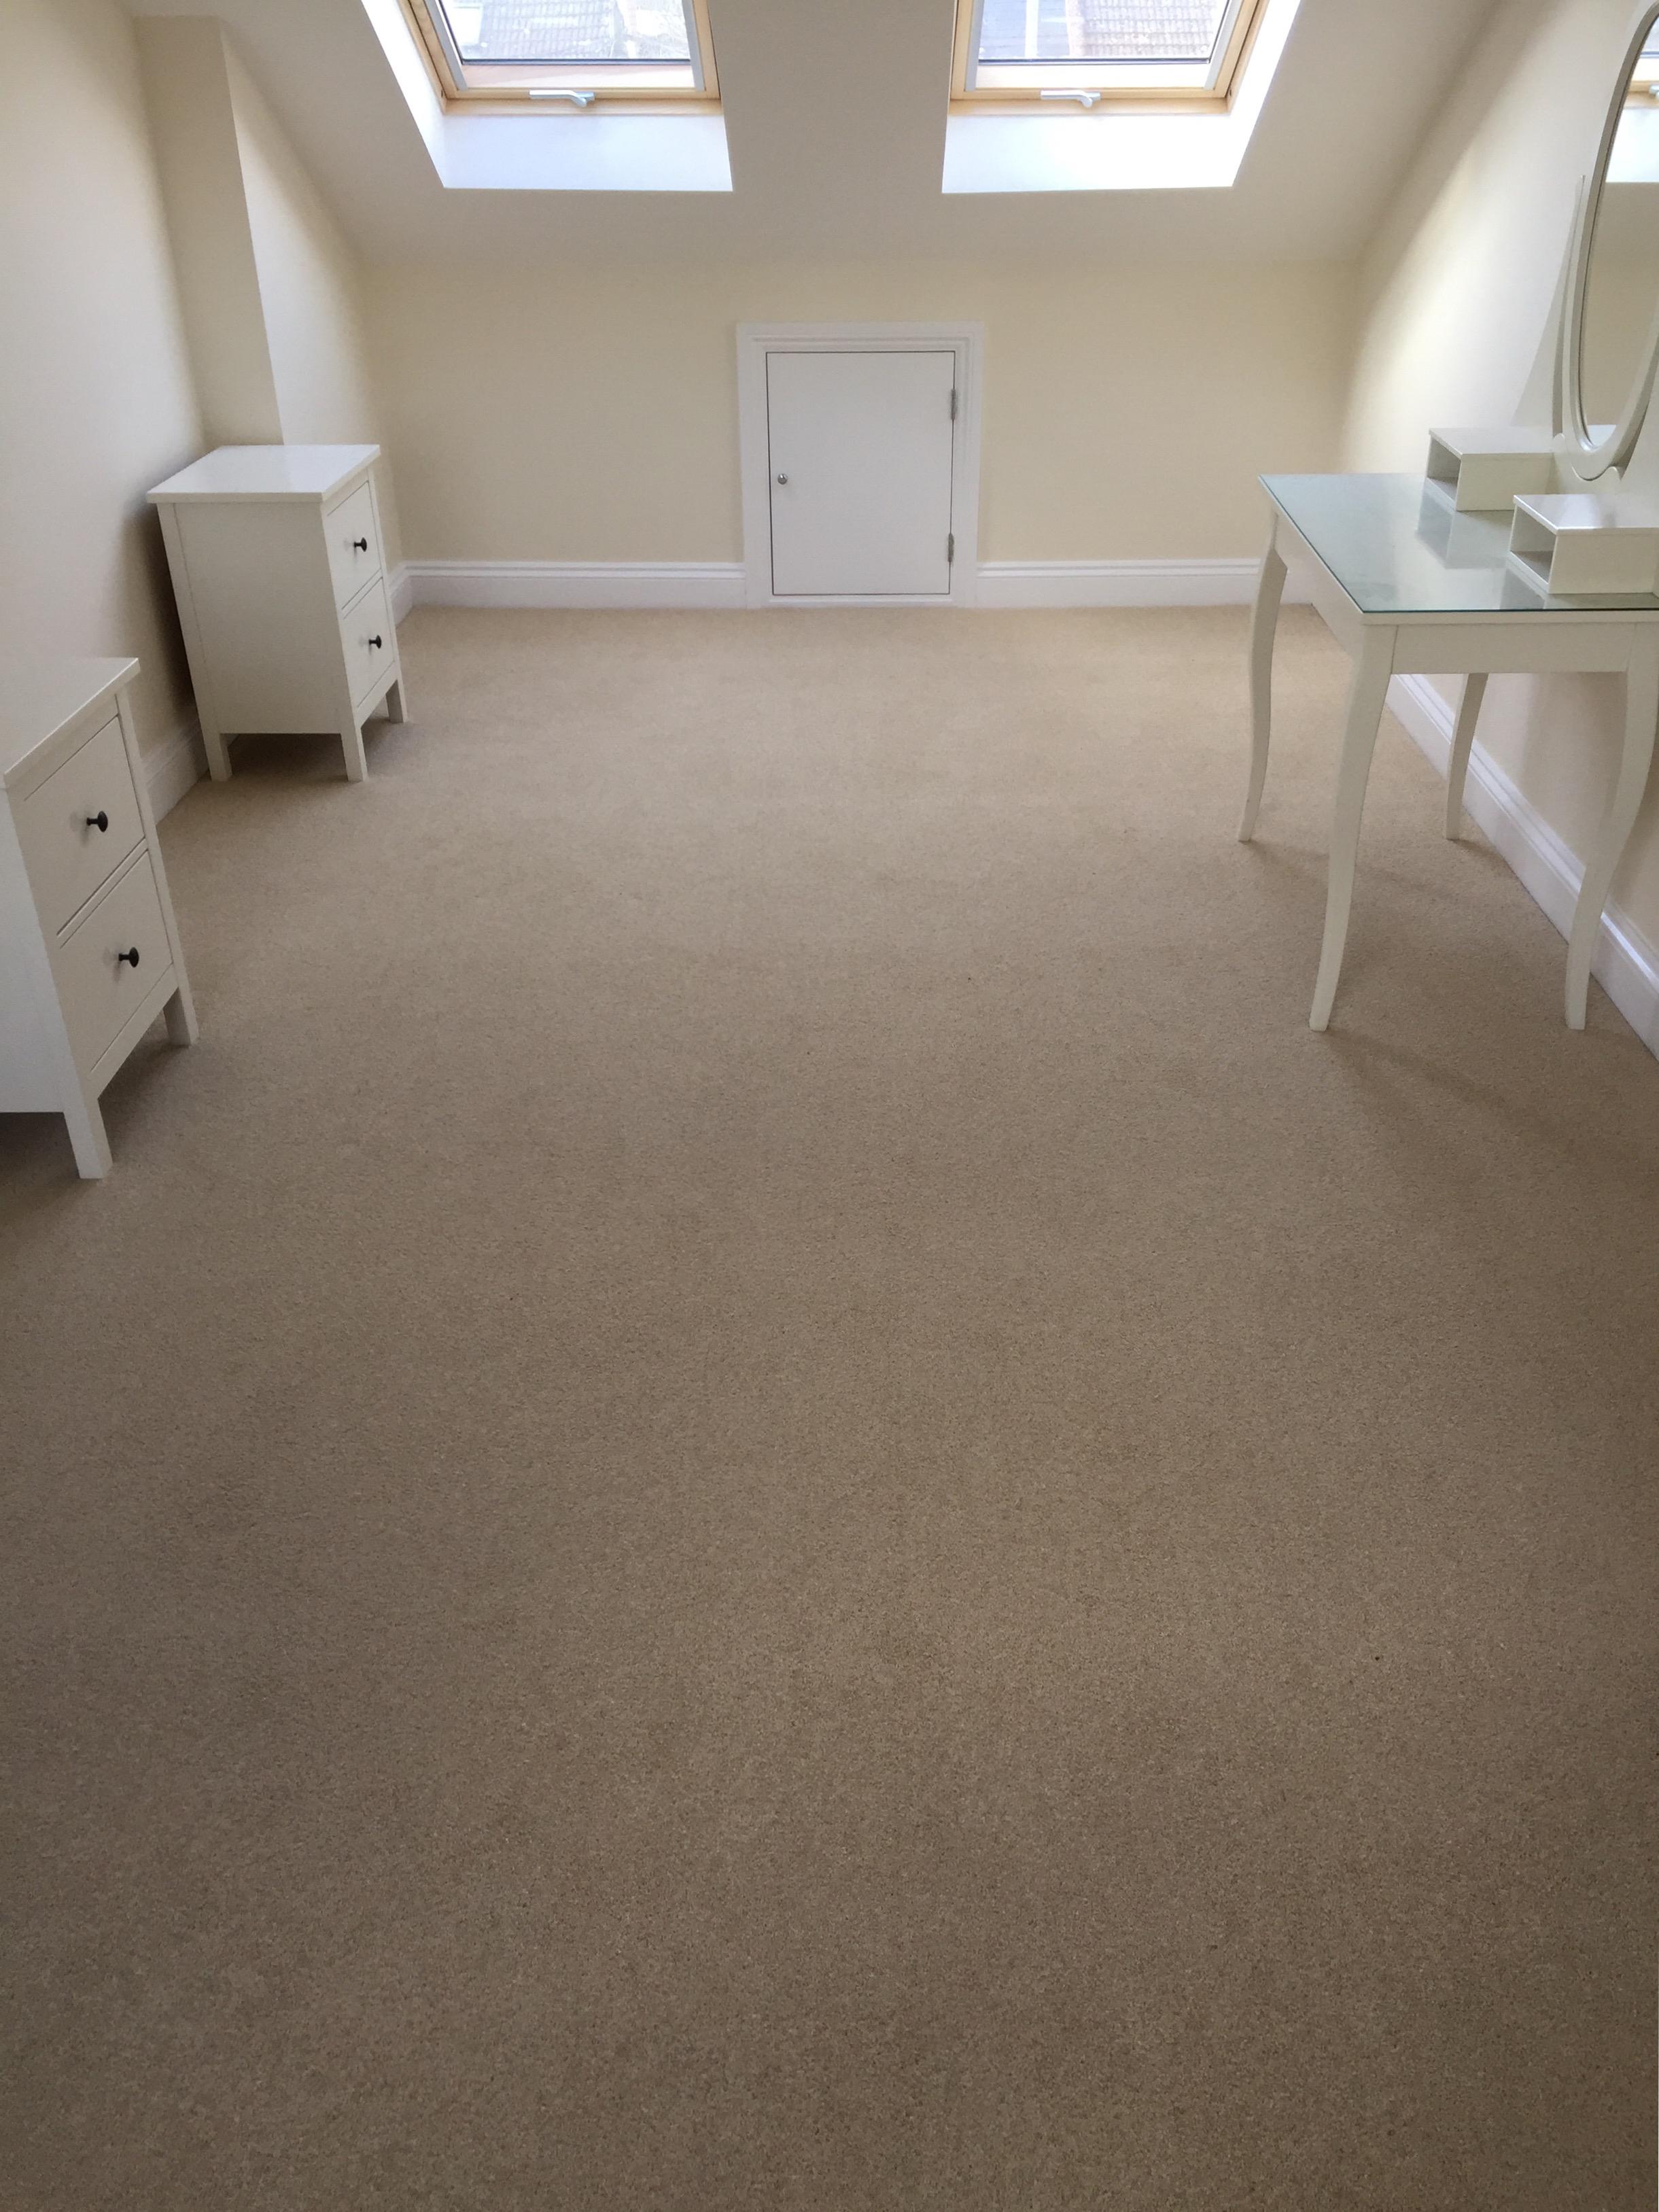 Bedroom Carpets Sussex, Beige bedroom carpet